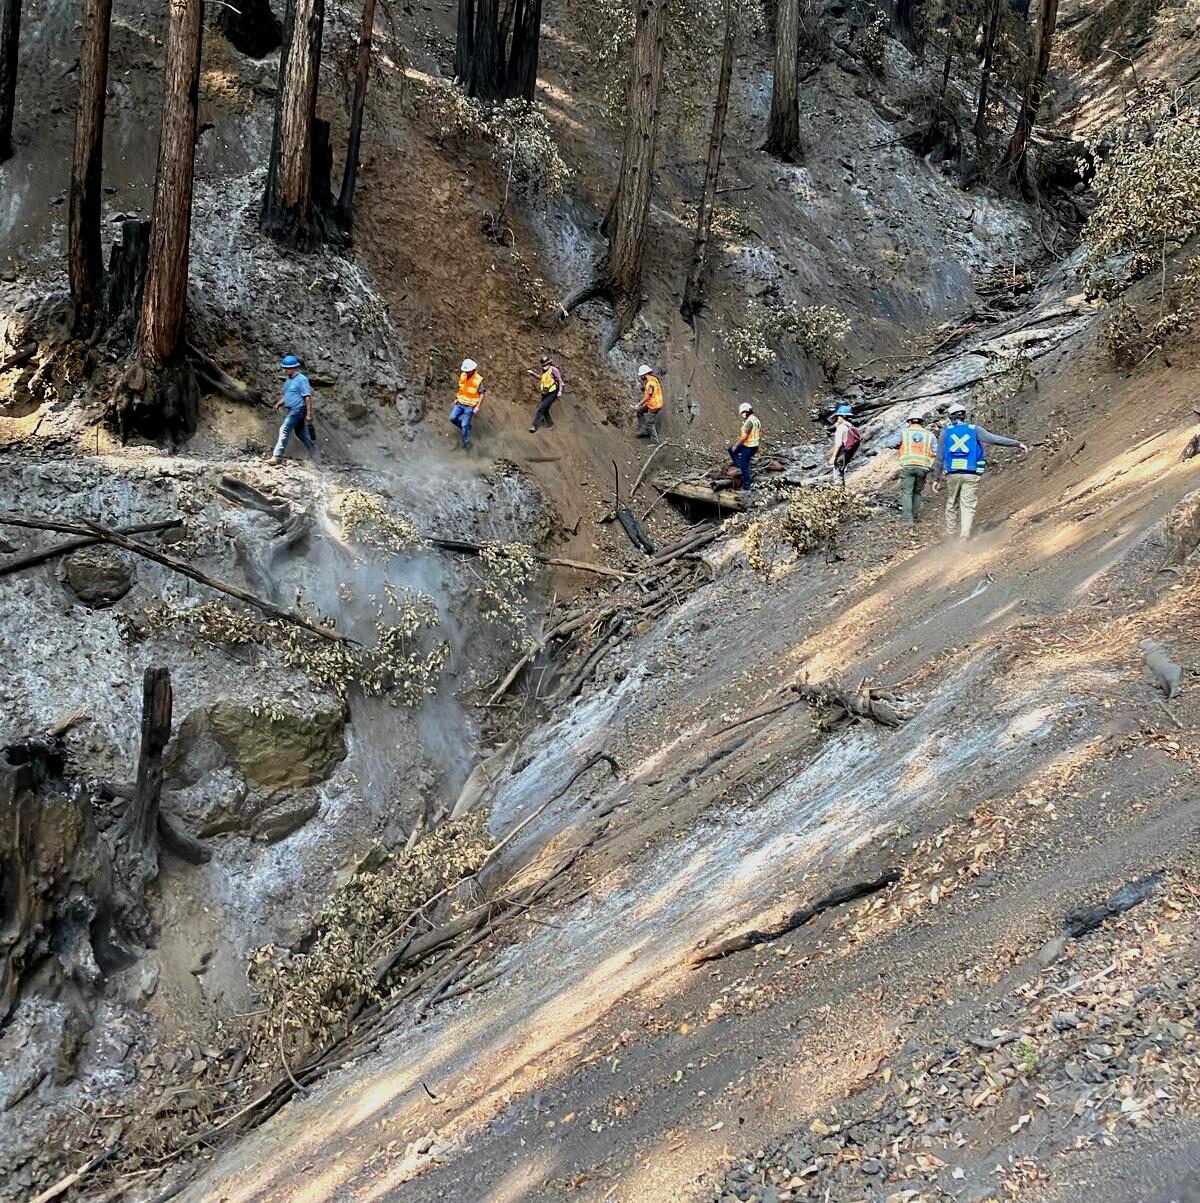 Geologists CZU burn scar